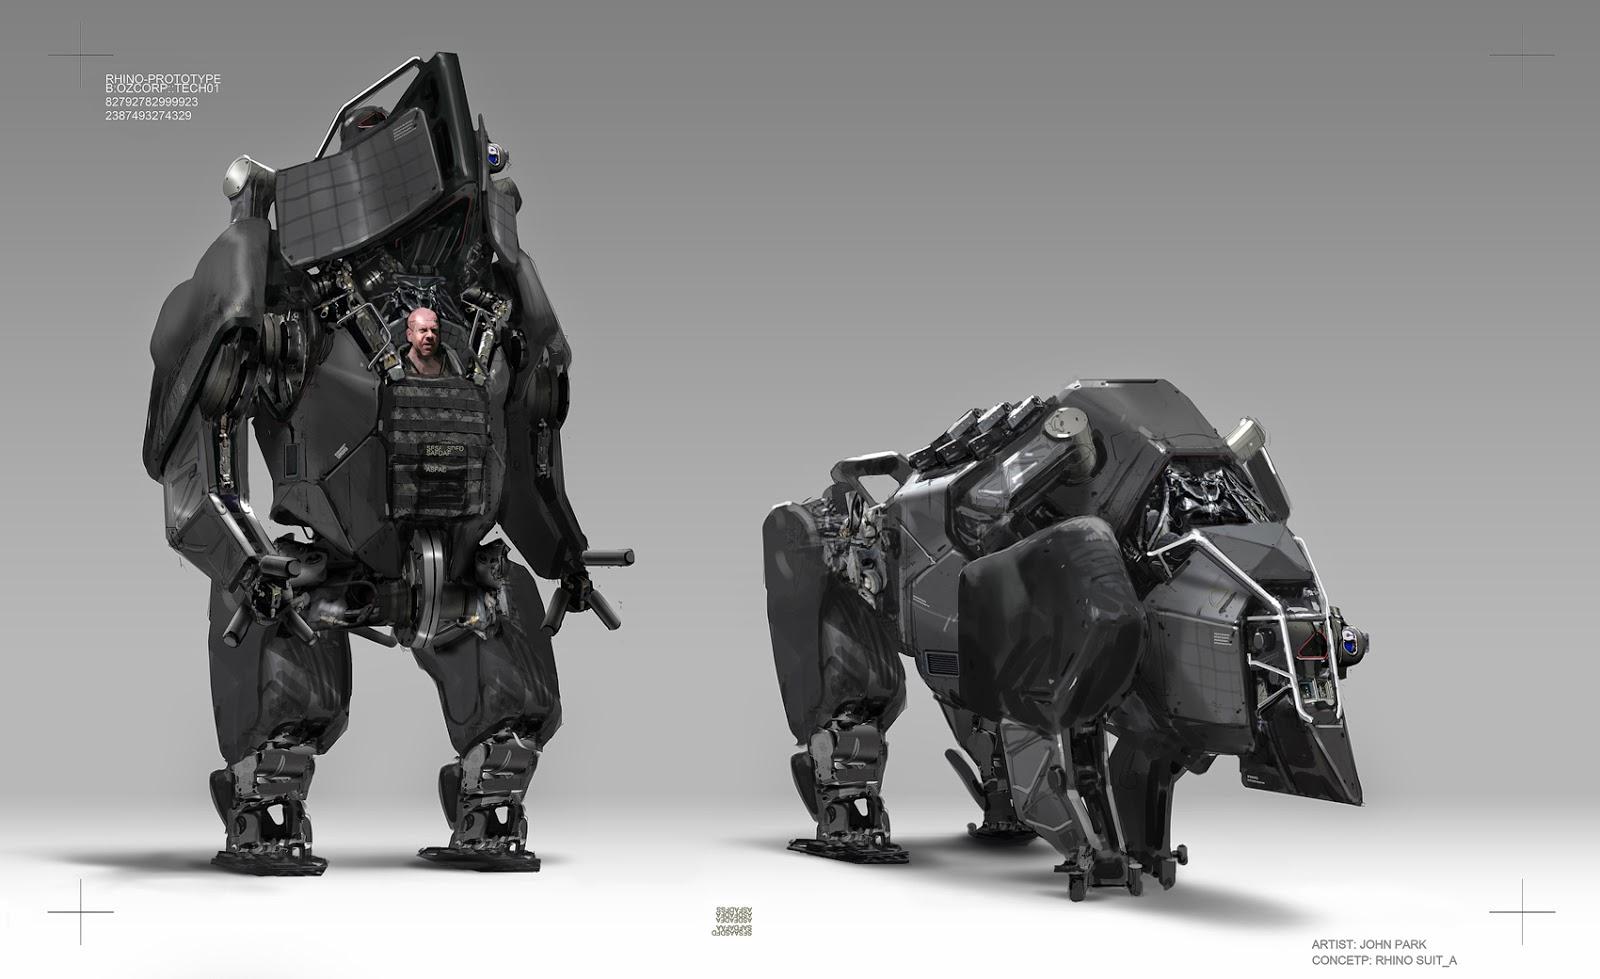 http://conceptartworld.com/wp-content/uploads/2014/05/Amazing_Spider-Man_2_Rhino_Concept_Design_JP_01.jpg